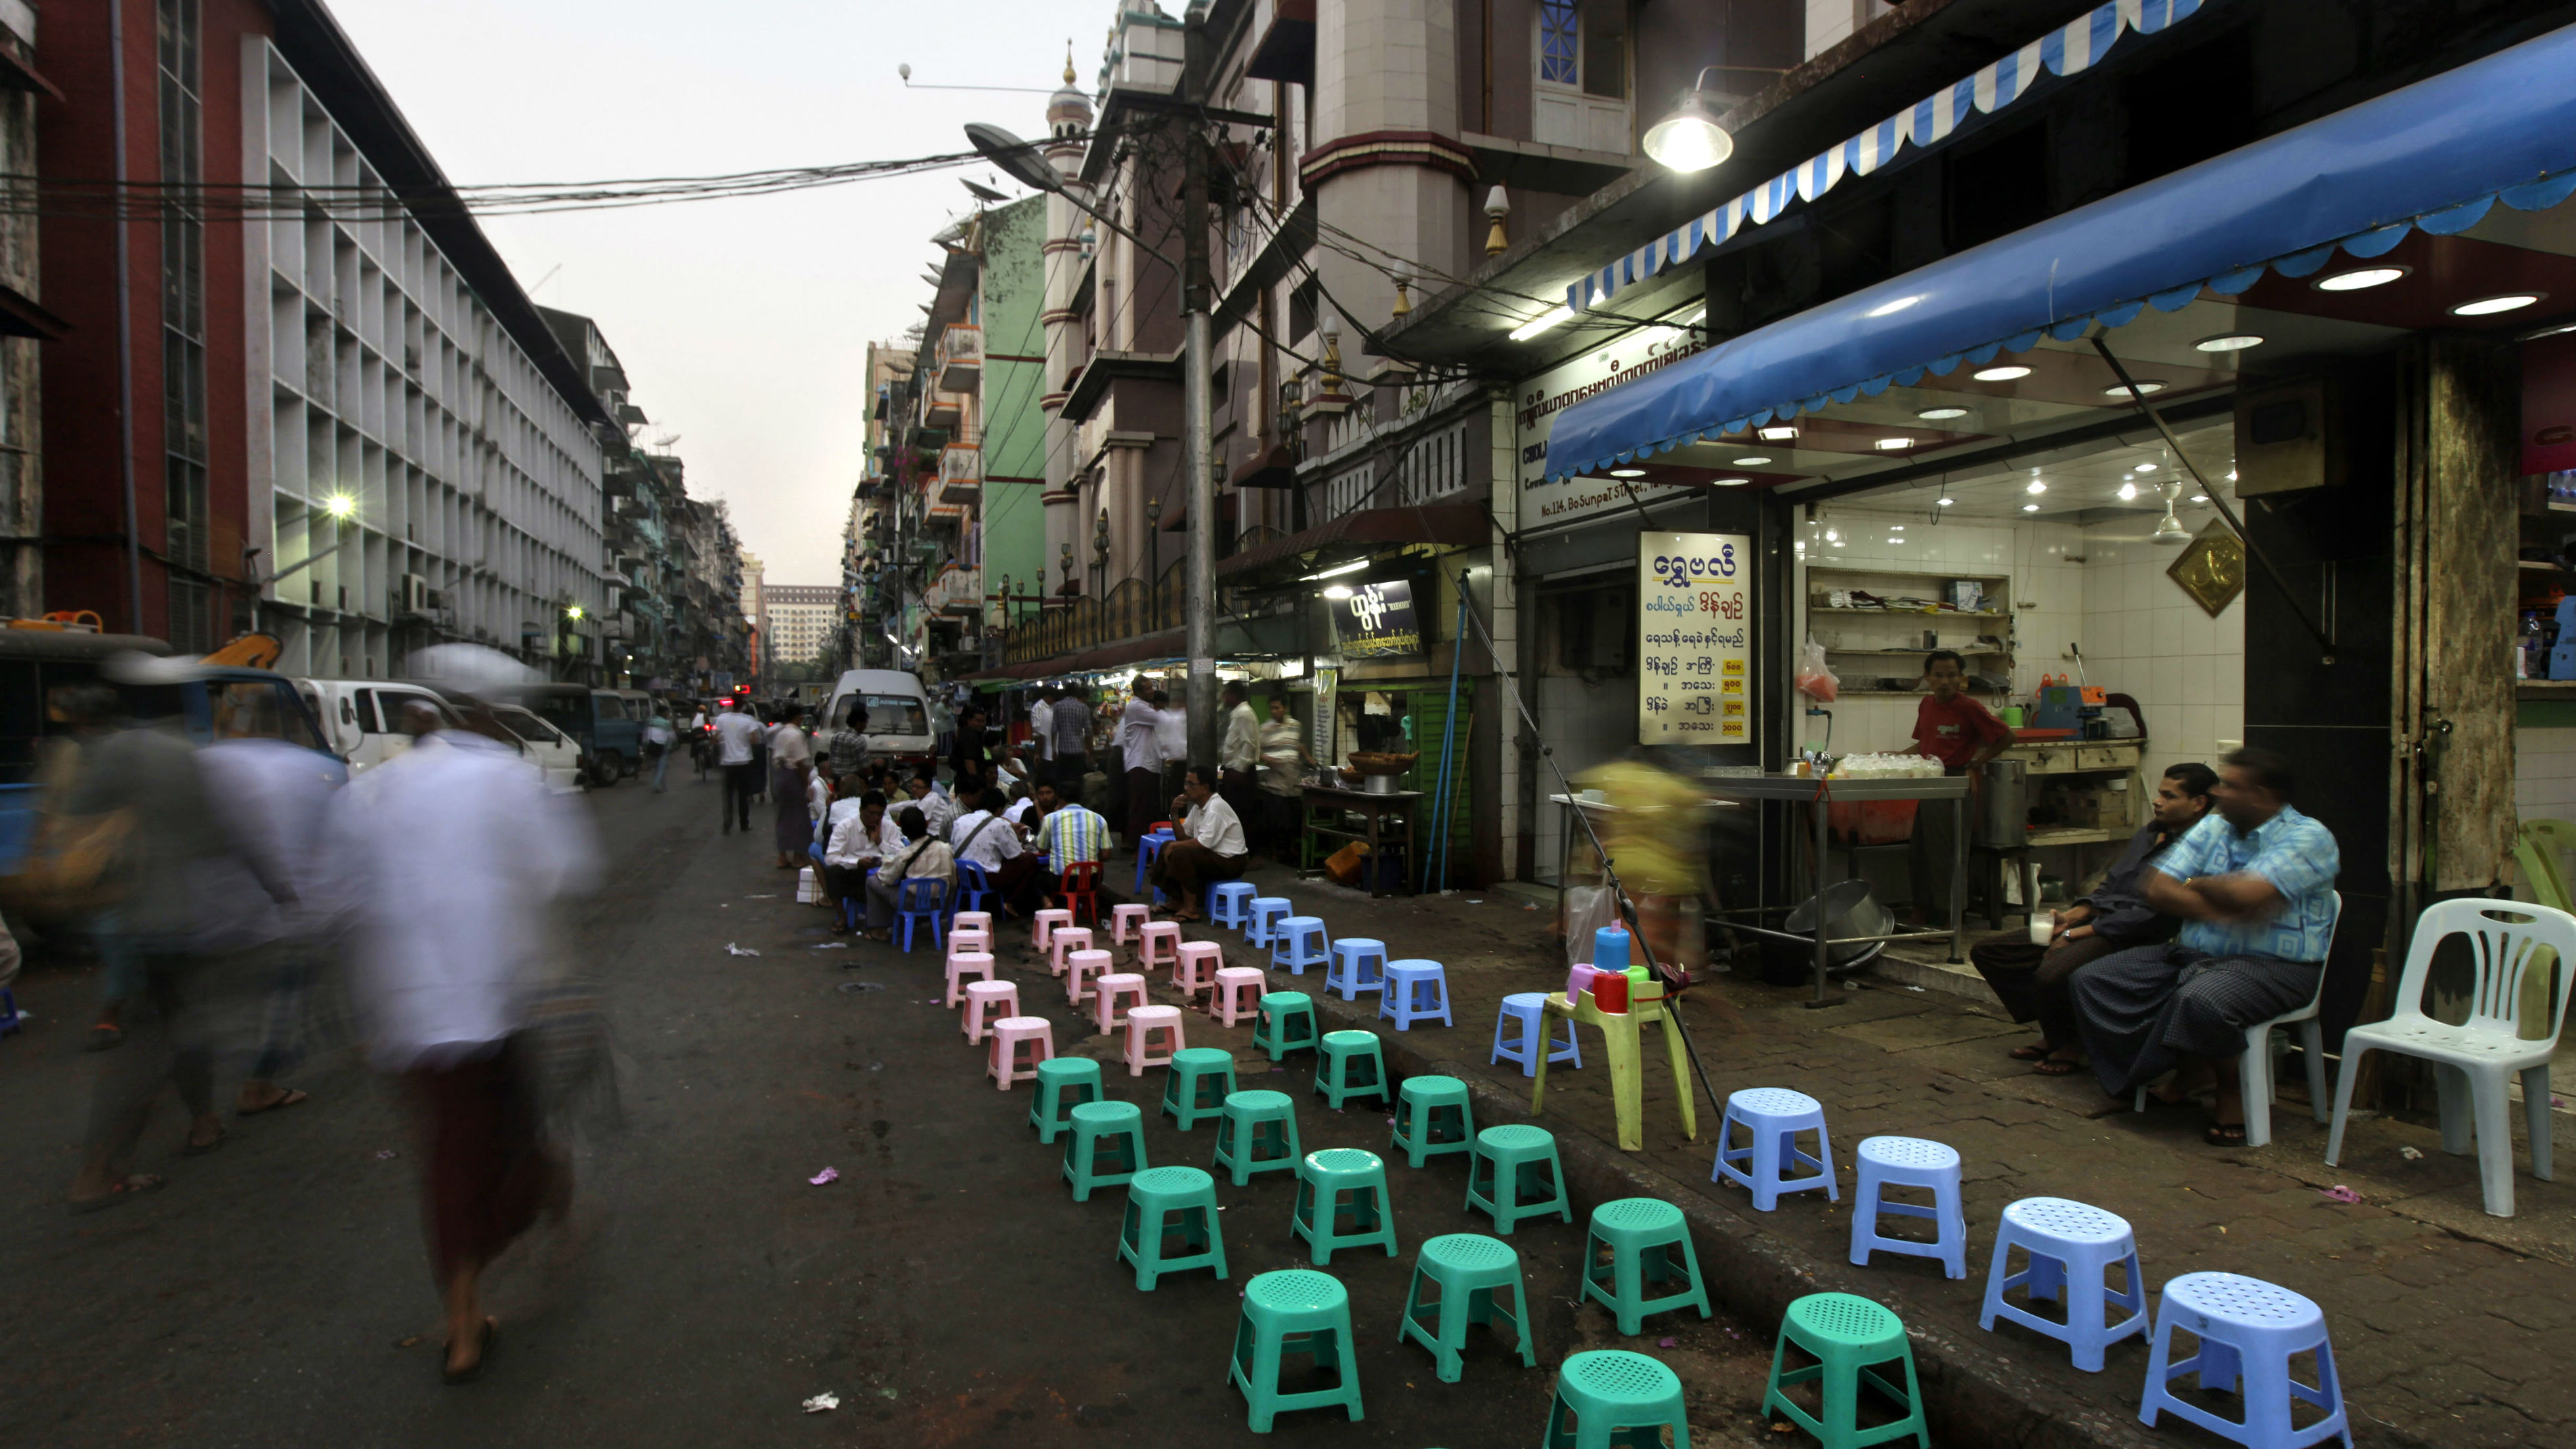 Burma-web-9-27-2012